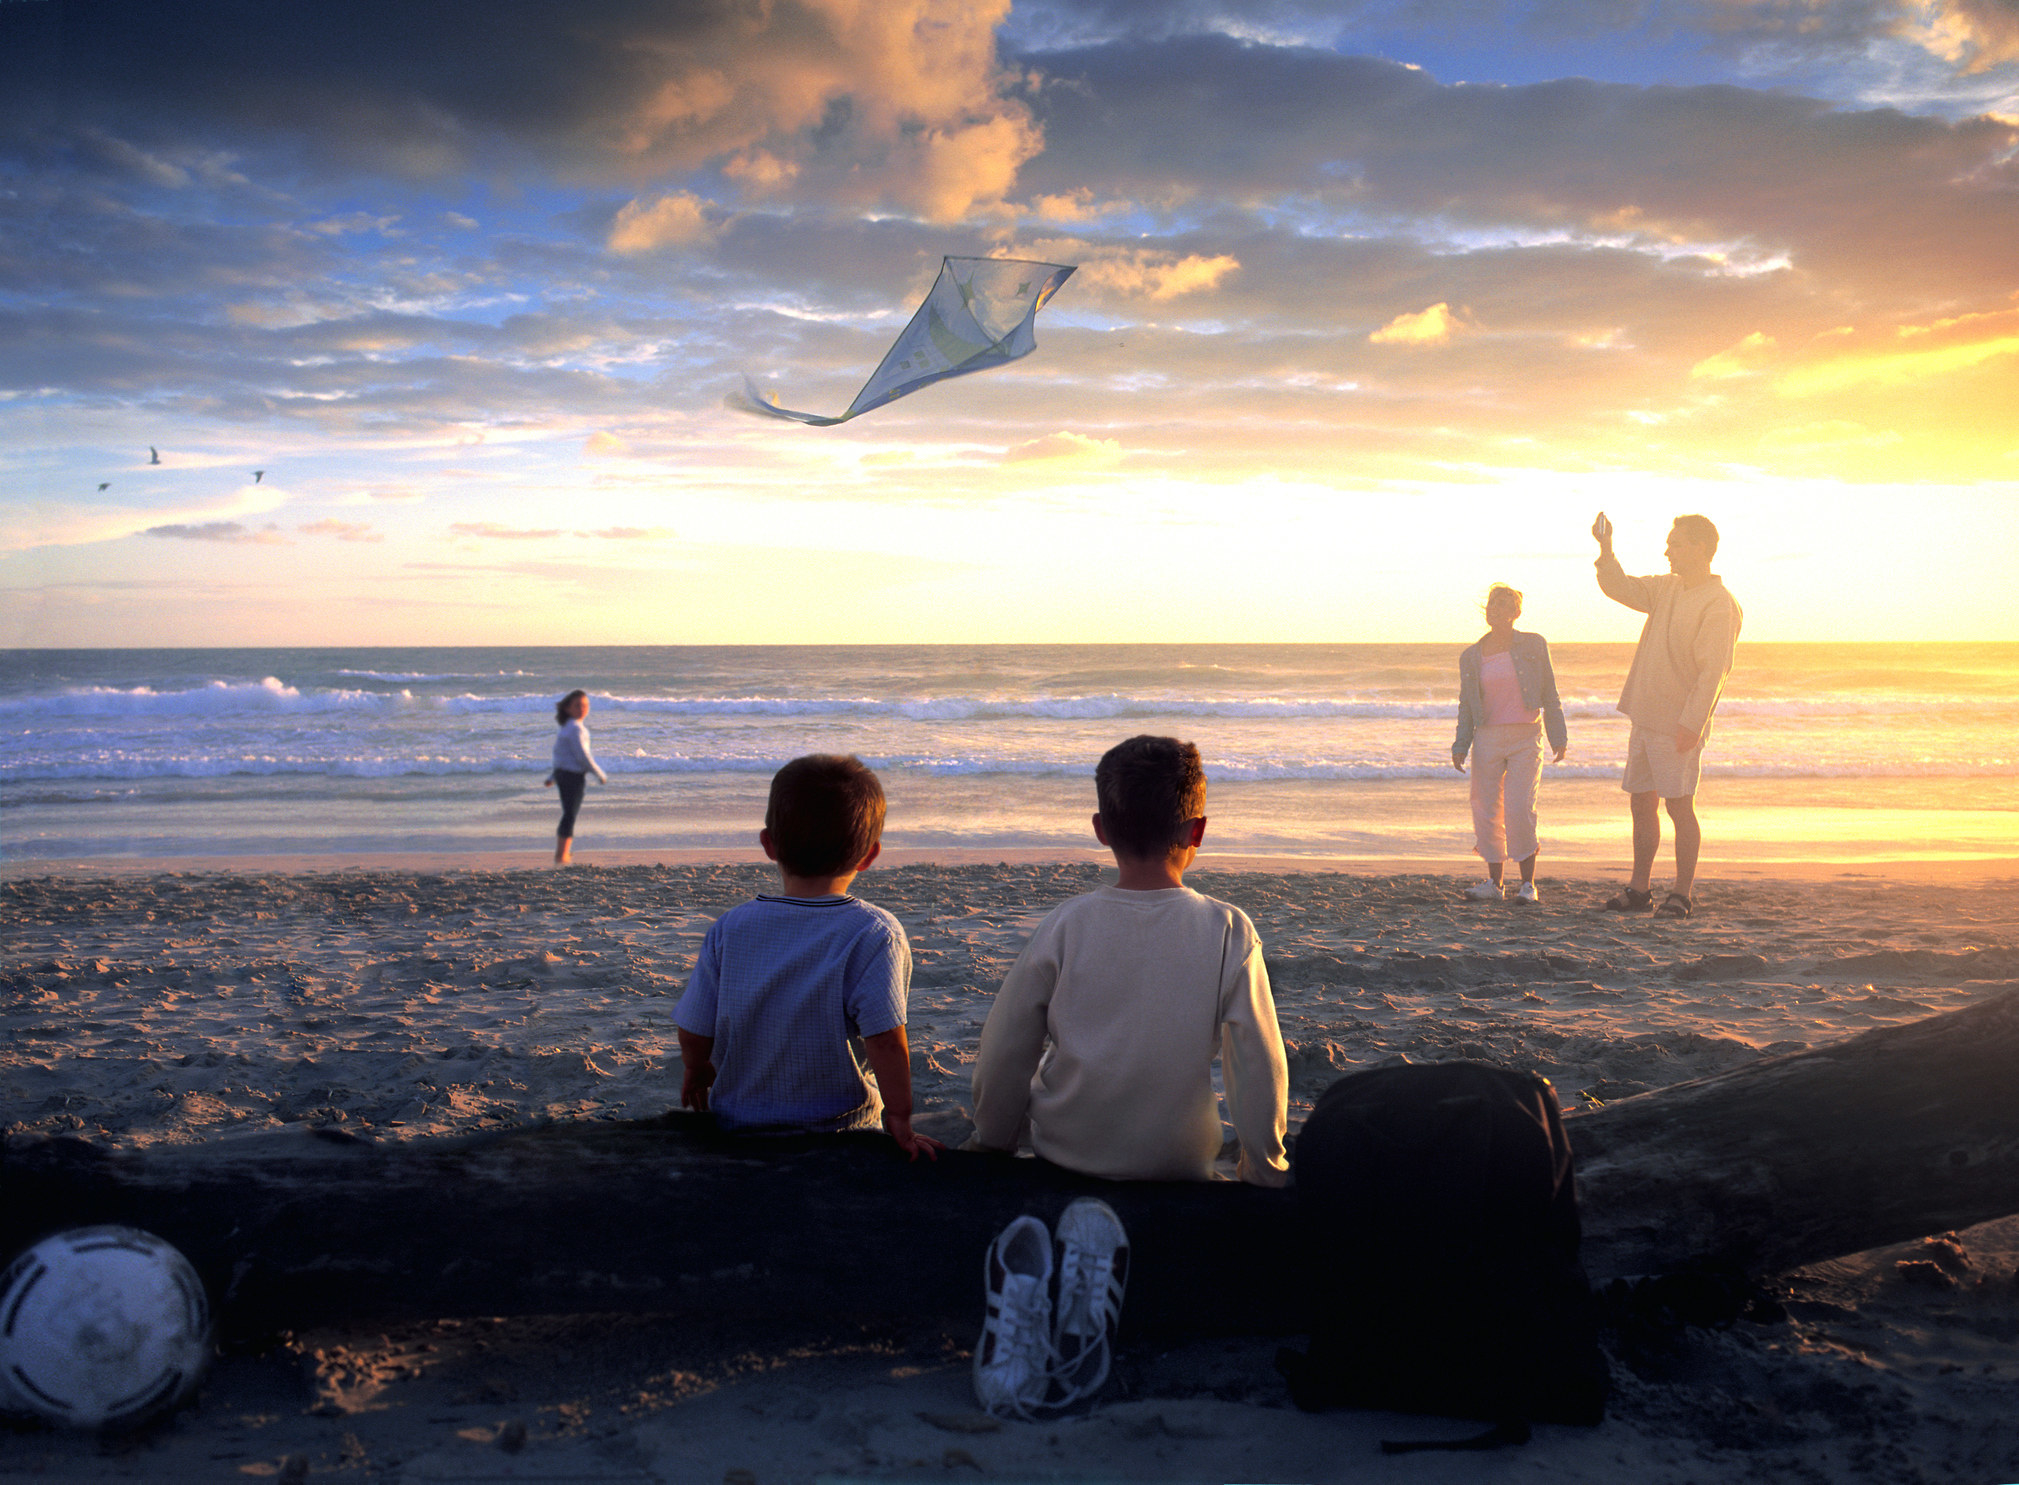 A family having fun on a beach